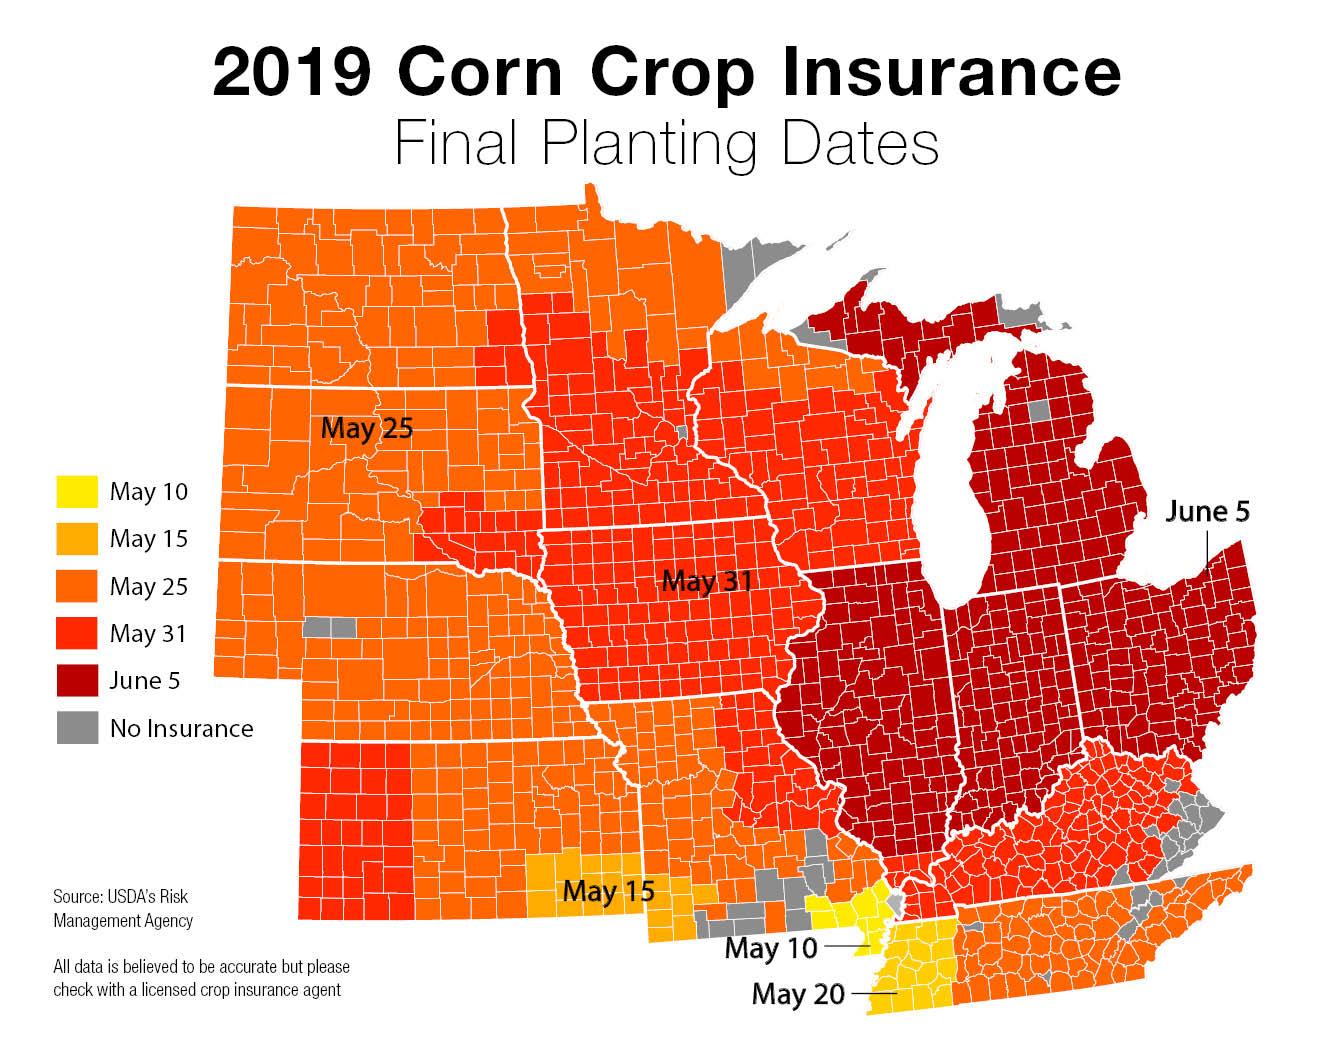 2019 final corn planting dates